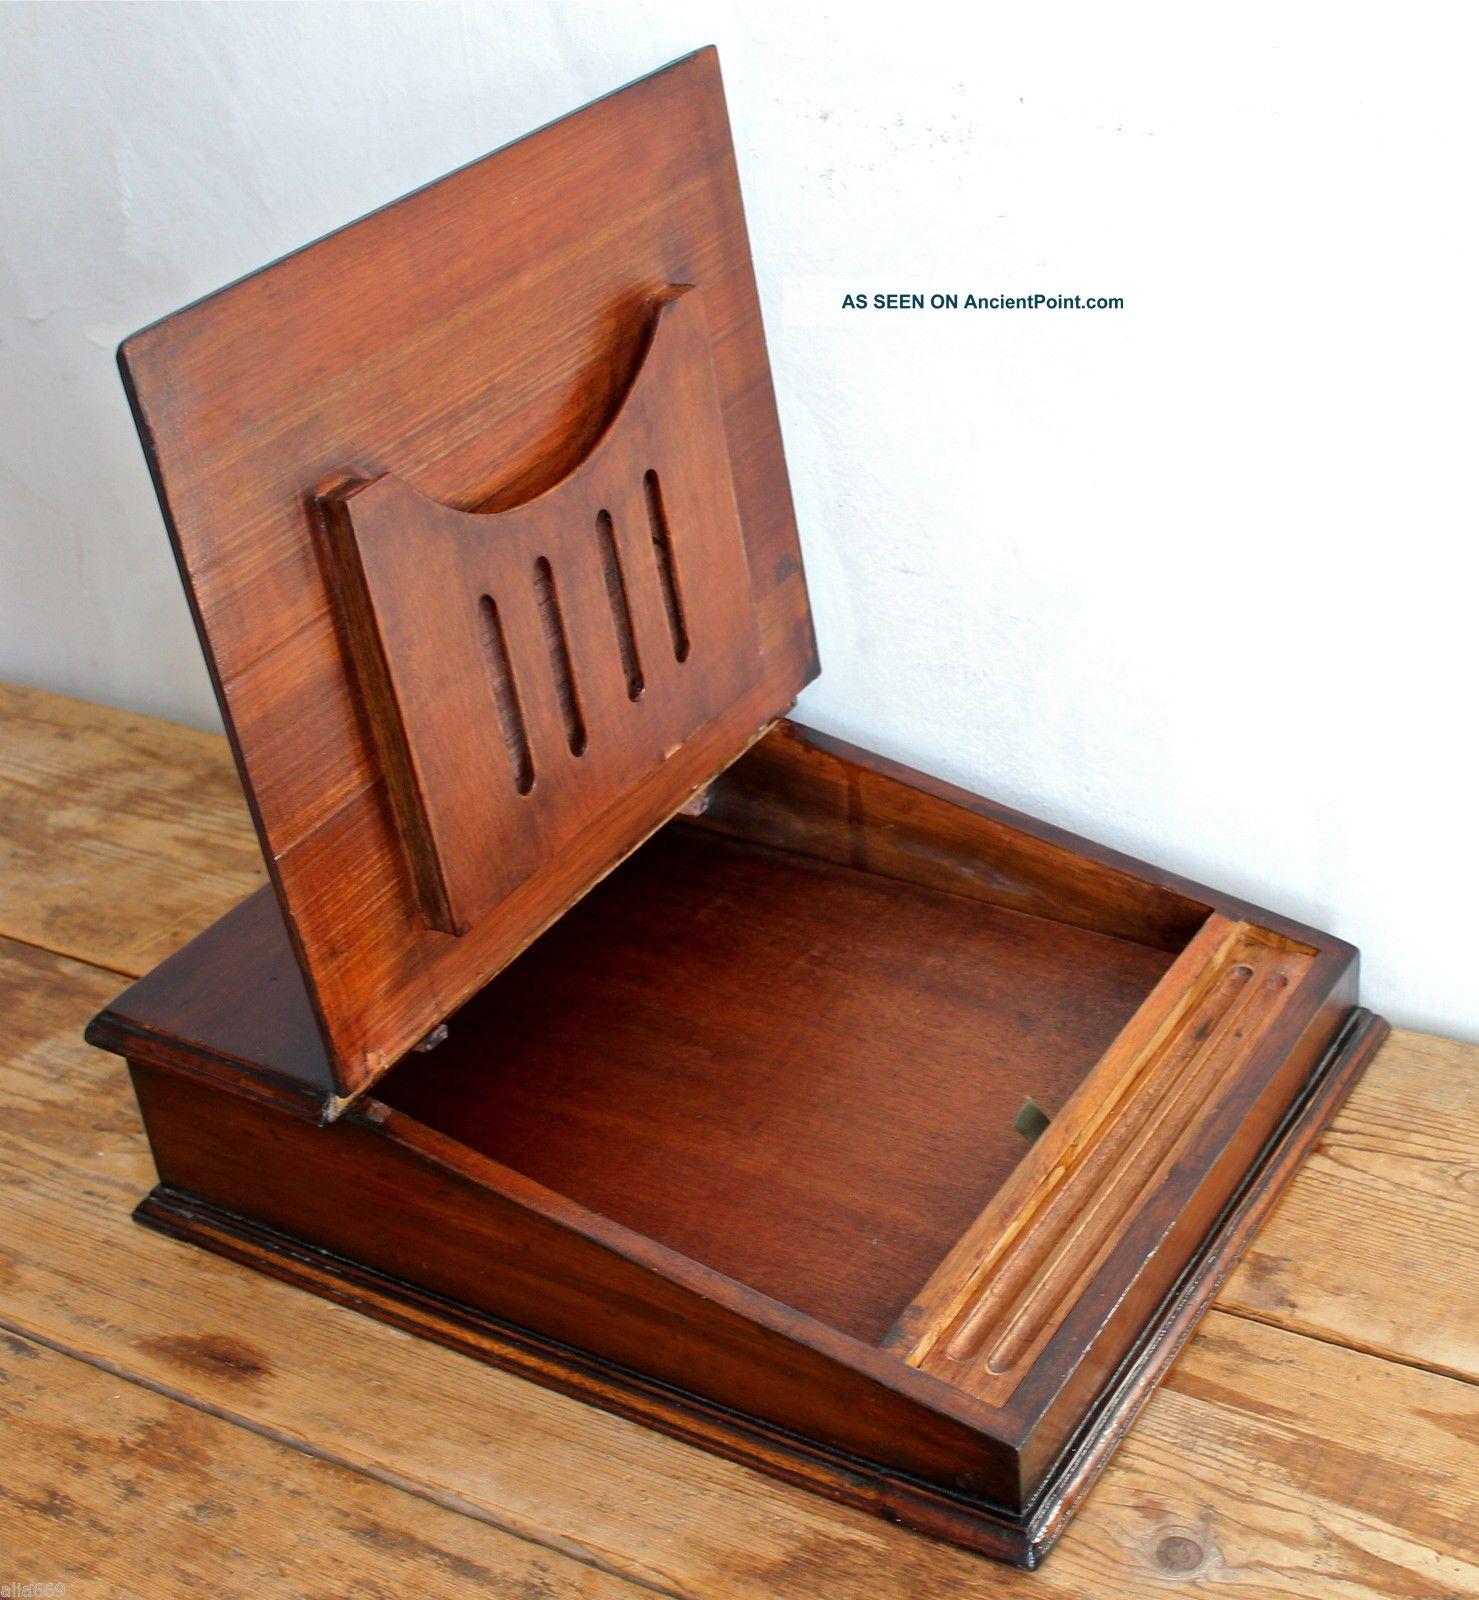 Vintage Antique Writing Slope Stationery Box Secret Drawer Desk Top Tidy Chest 1800-1899 photo